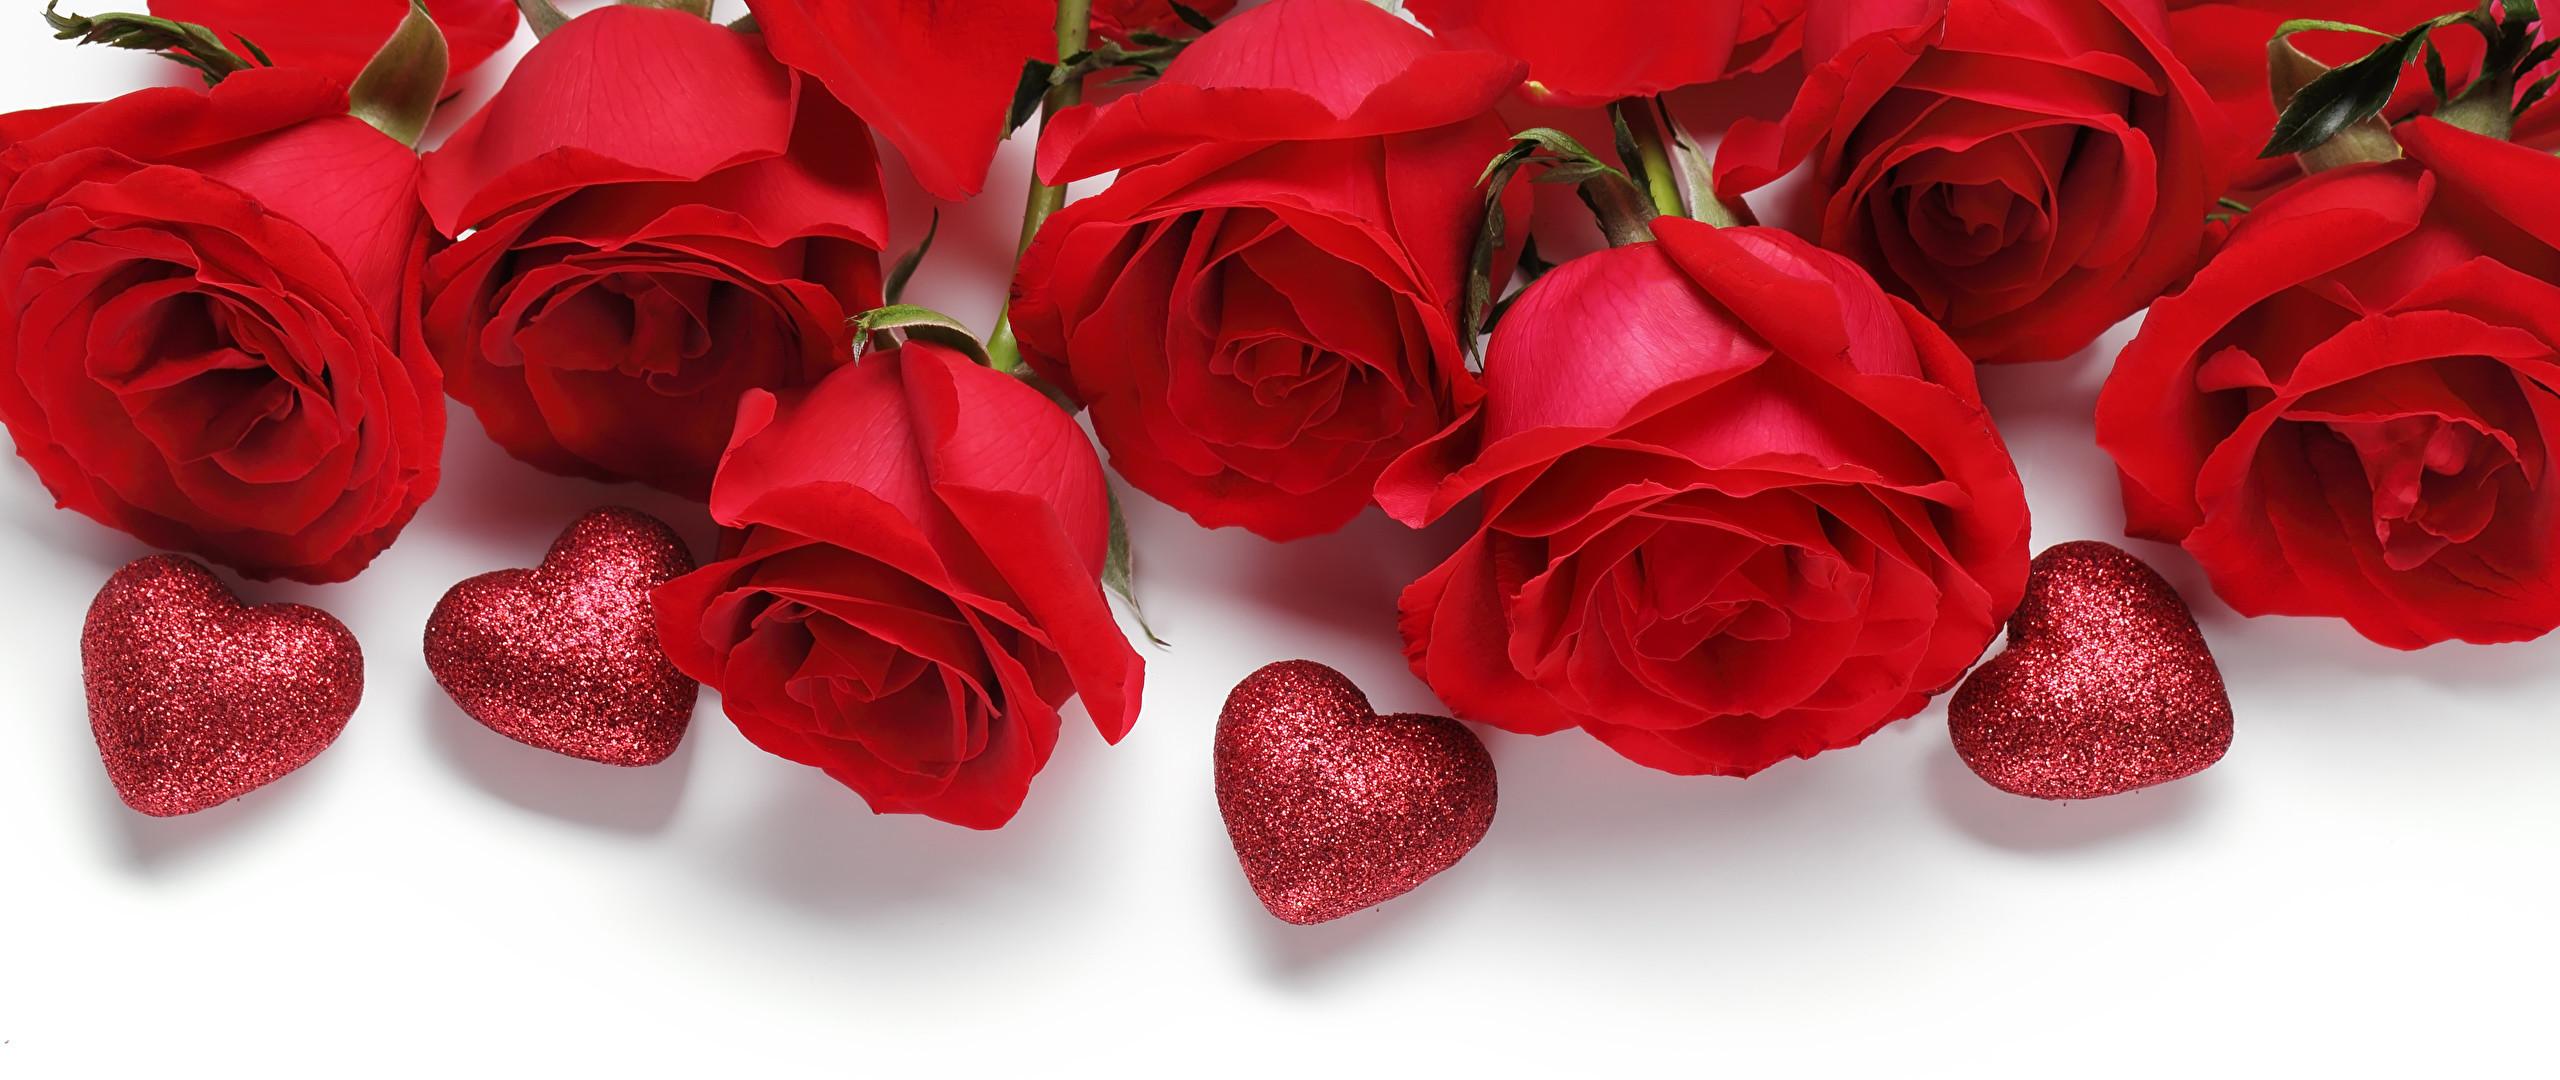 red rose flower background 183��